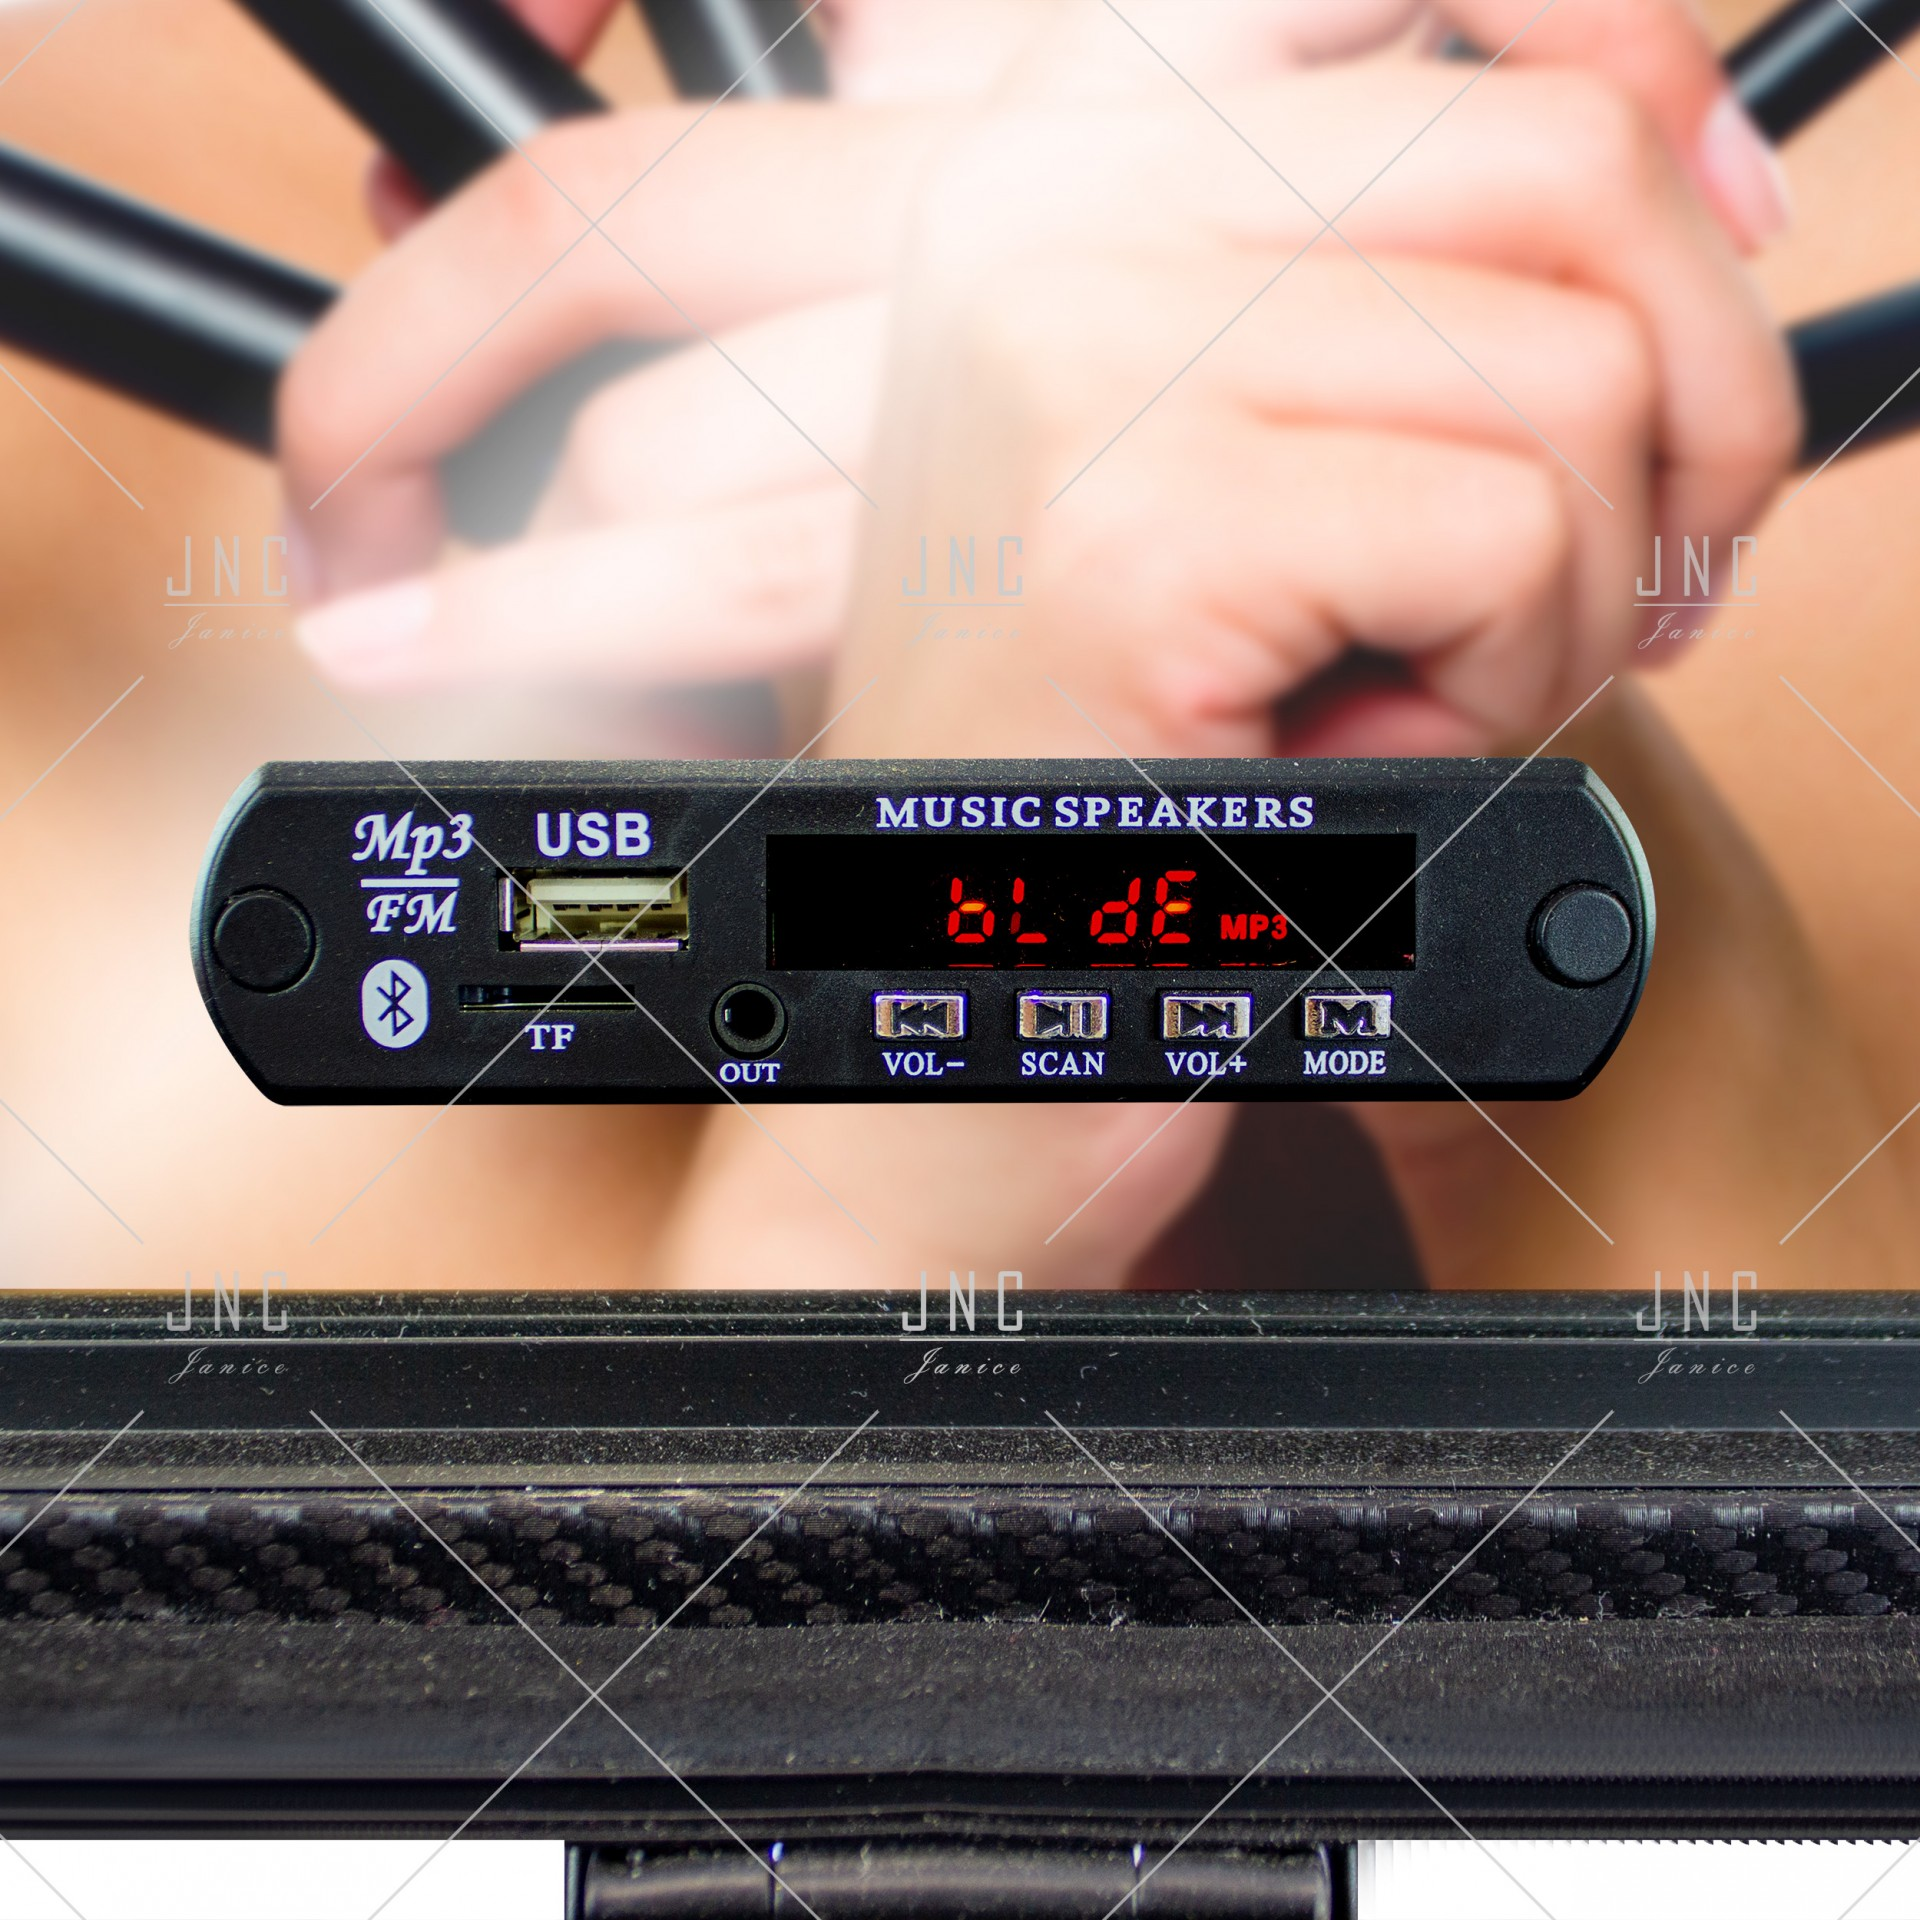 Maleta Maquilhagem Camarim Profissional | Bluetooth - USB - Rádio